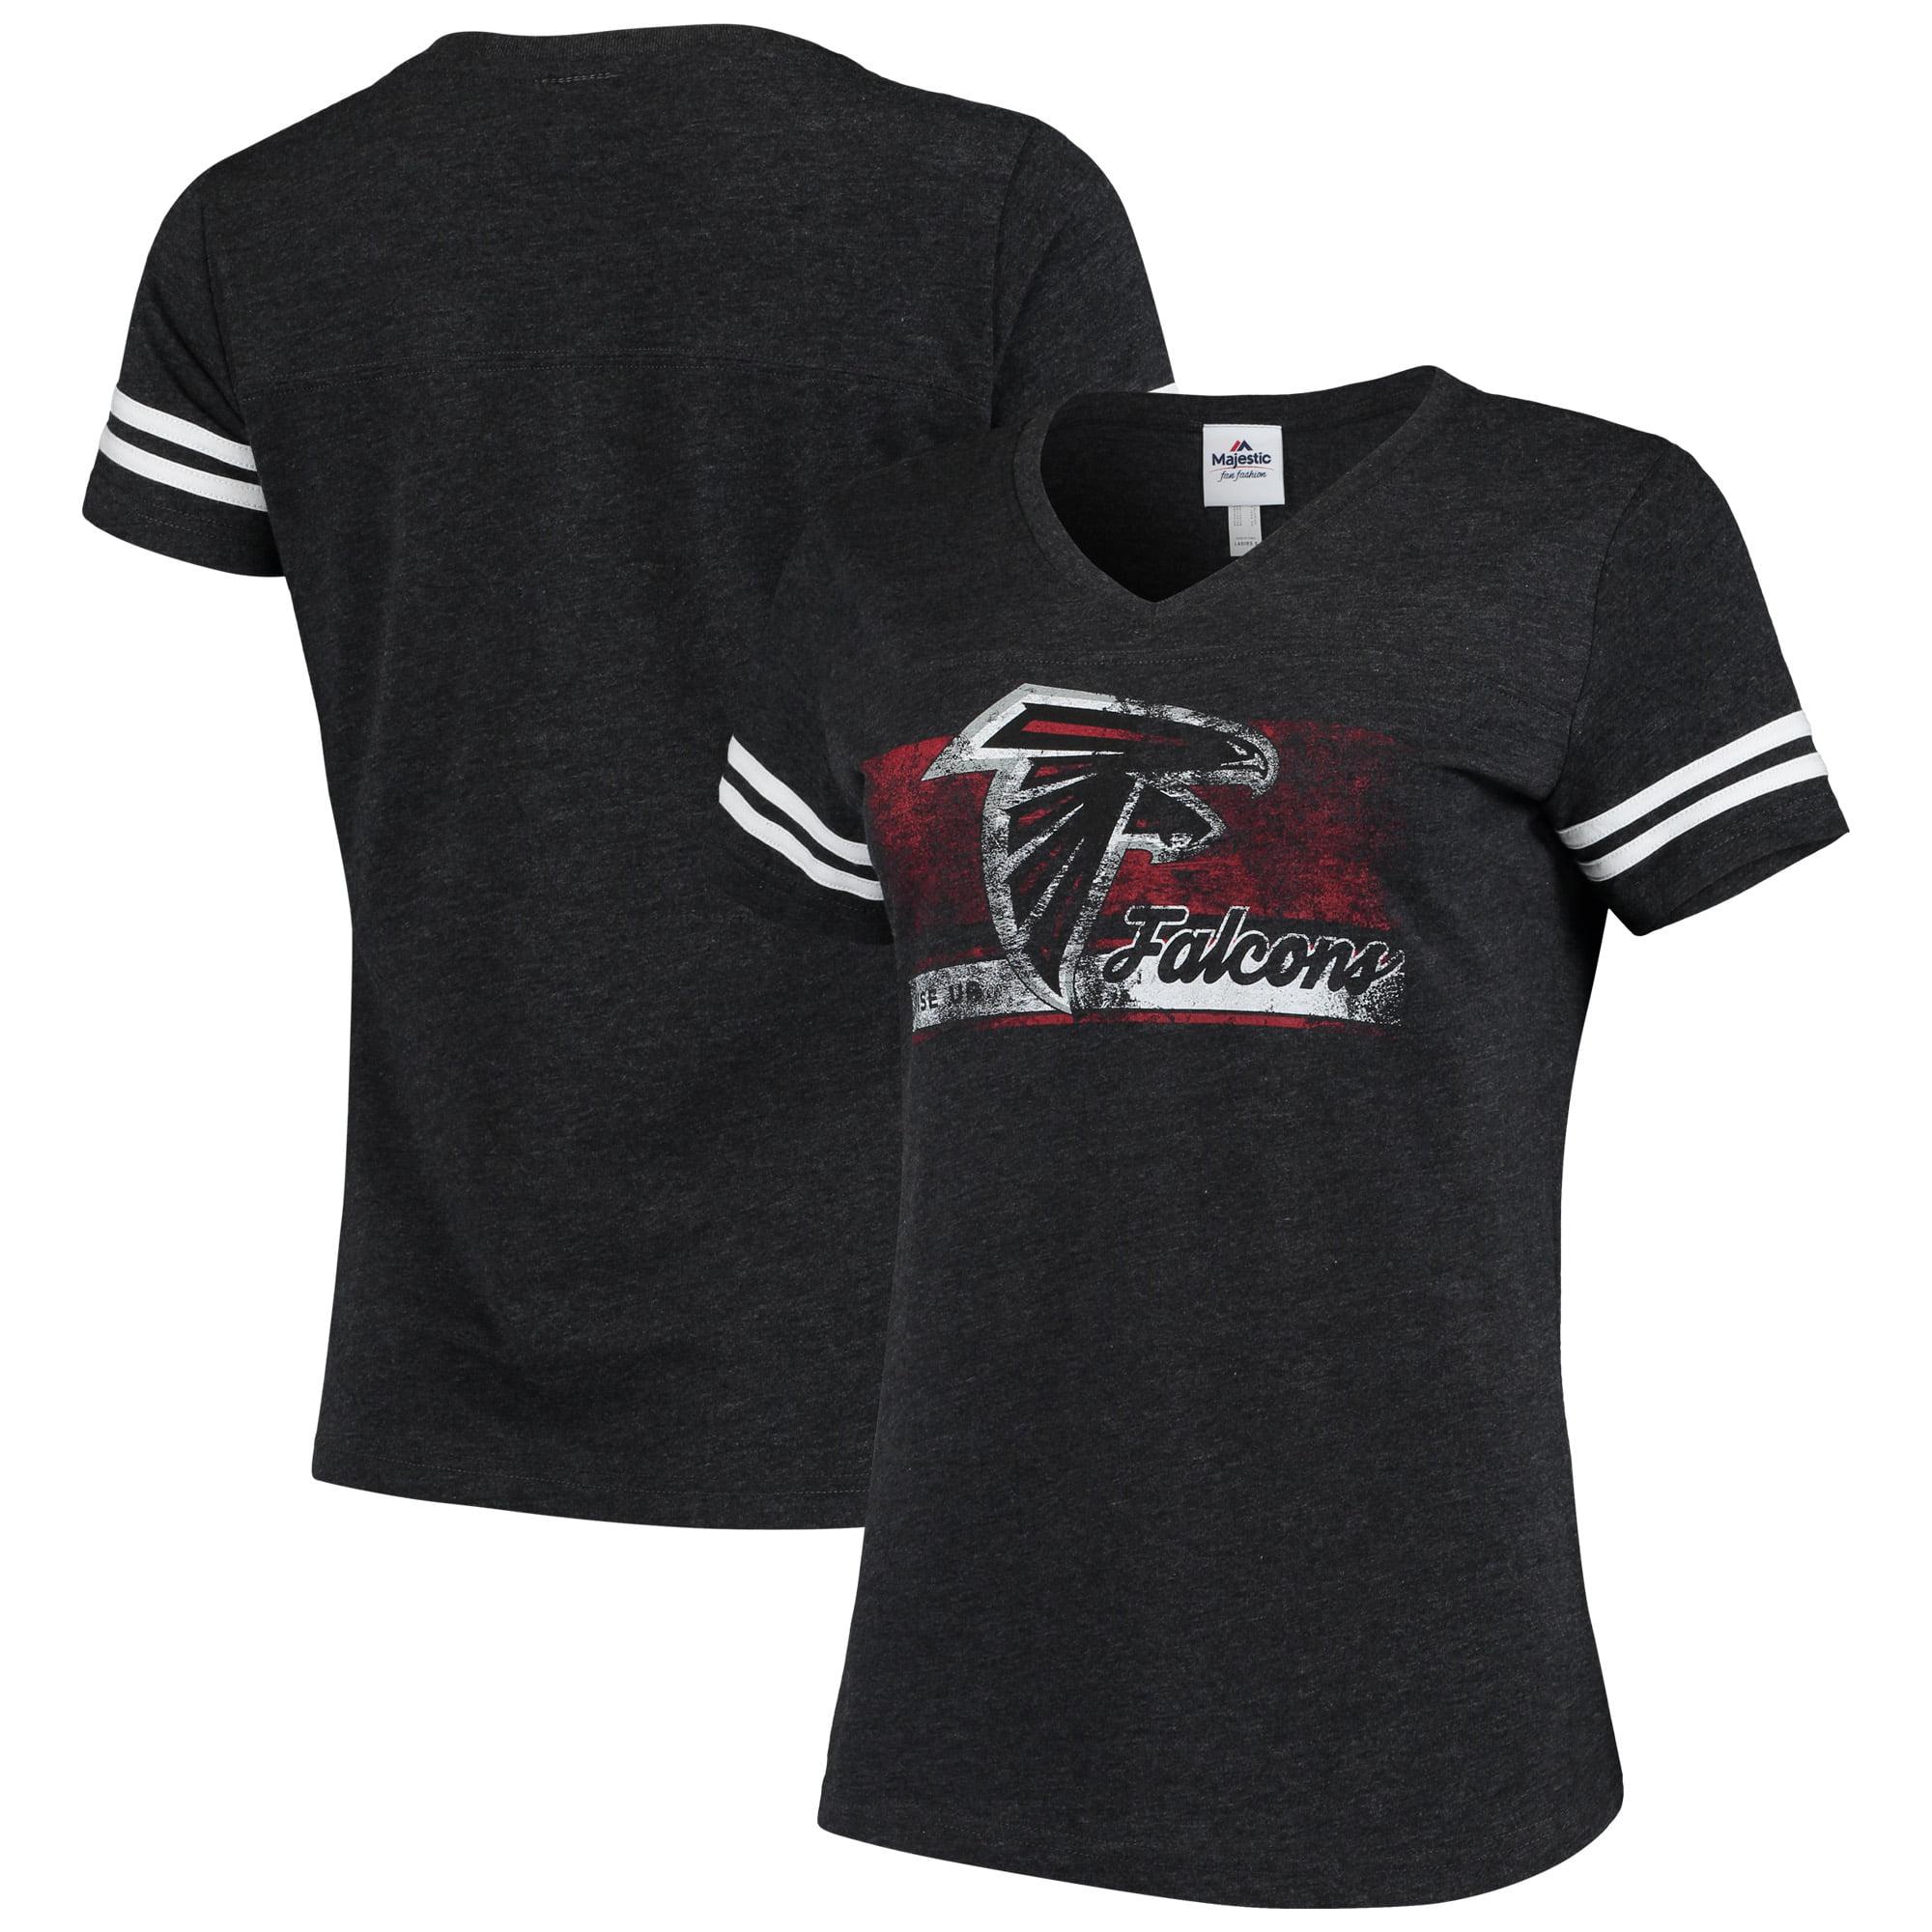 Atlanta Falcons Majestic Women's Legendary Look V-Neck T-Shirt - Heathered Charcoal/White